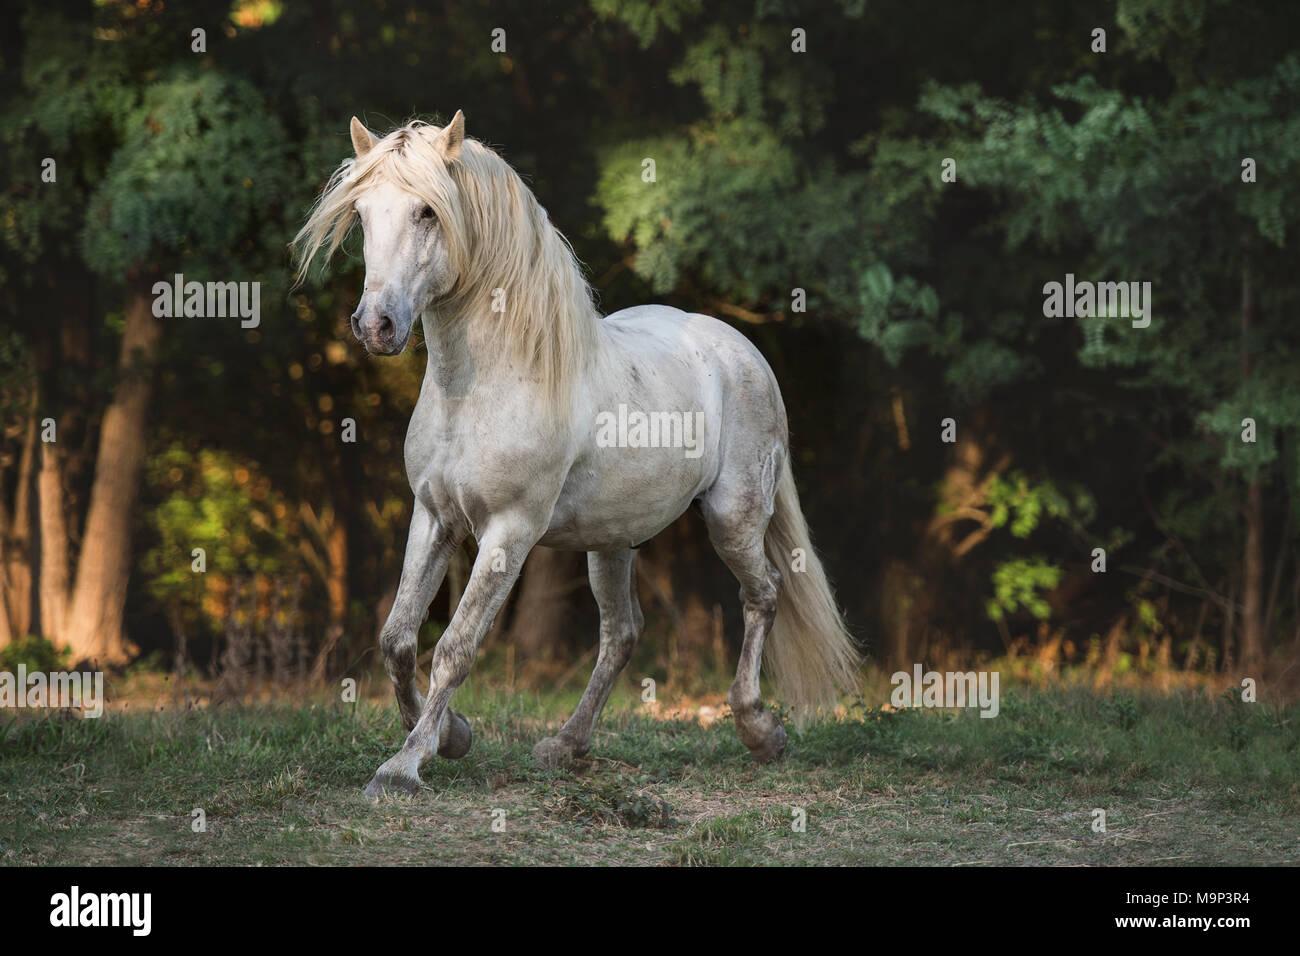 Semental de Camarga (Equus), al trote, Stallion, Francia Imagen De Stock